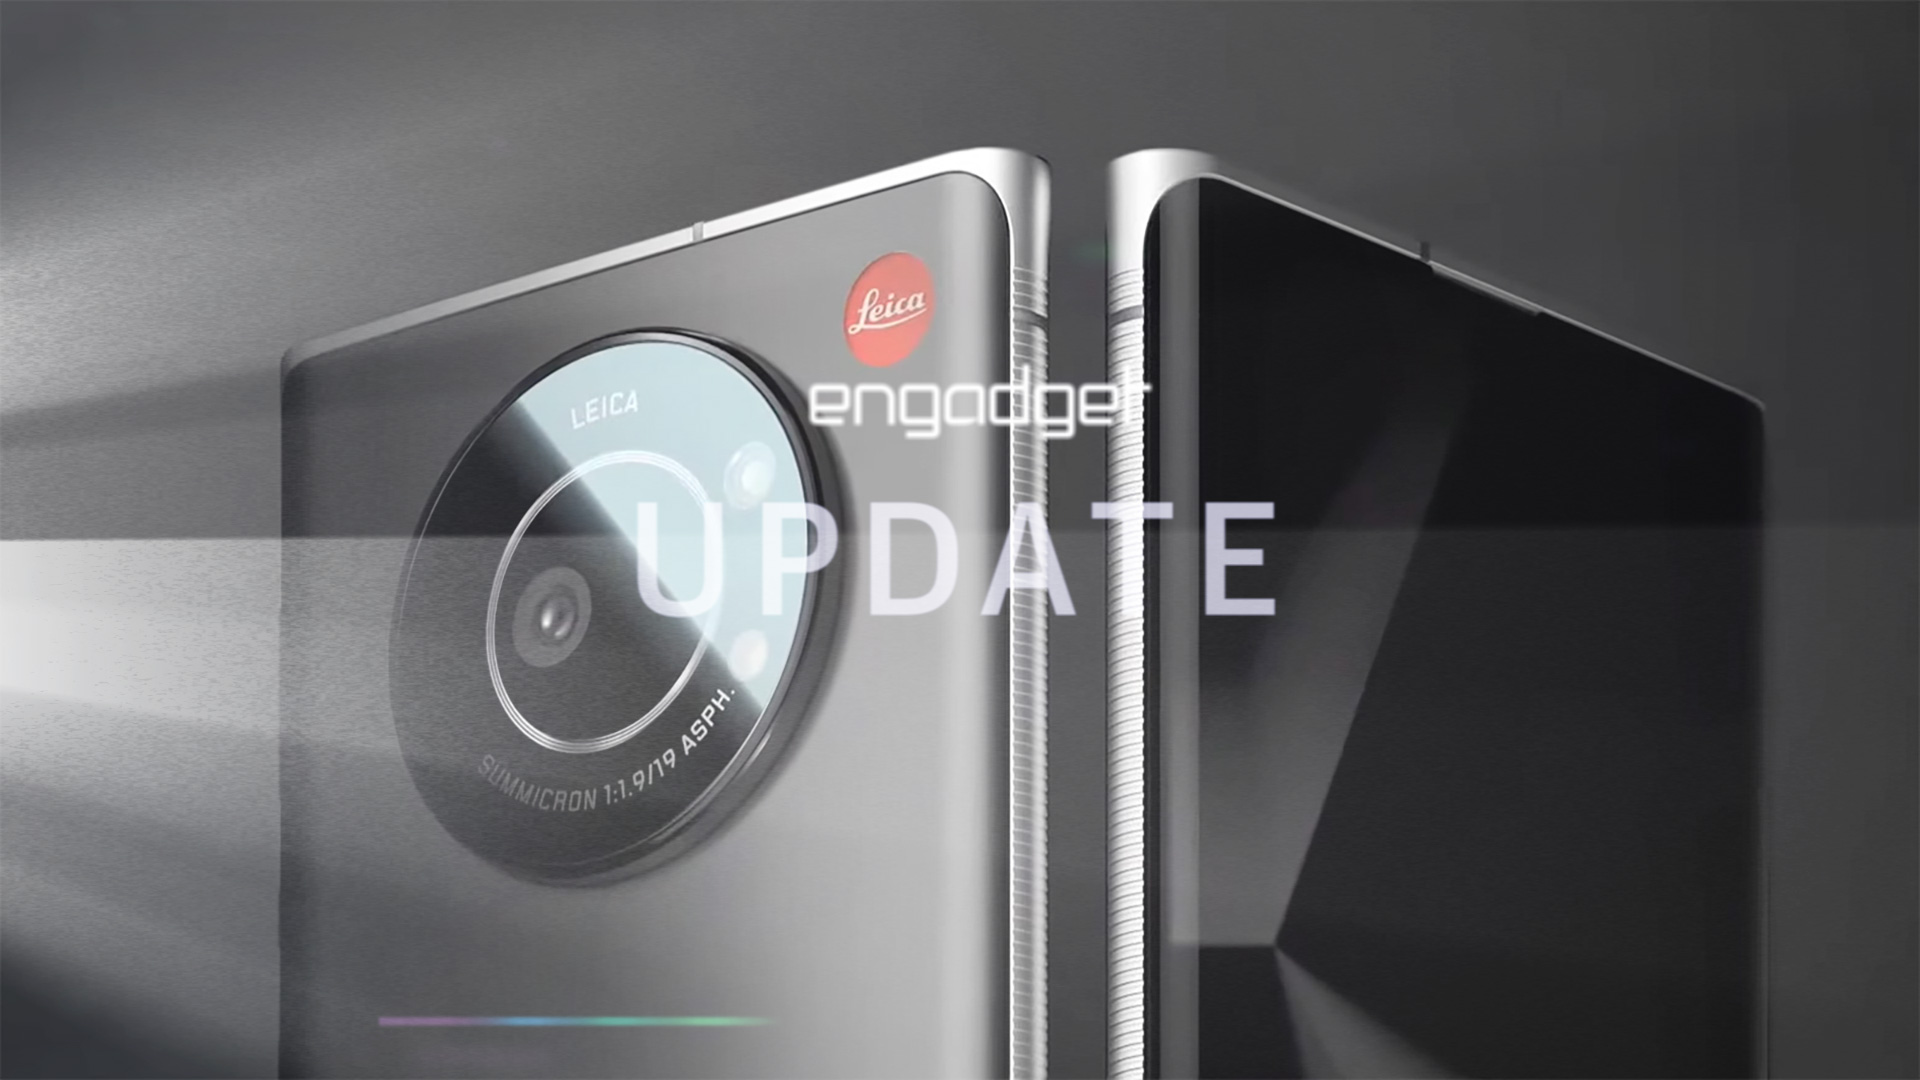 Engadget Update EP102